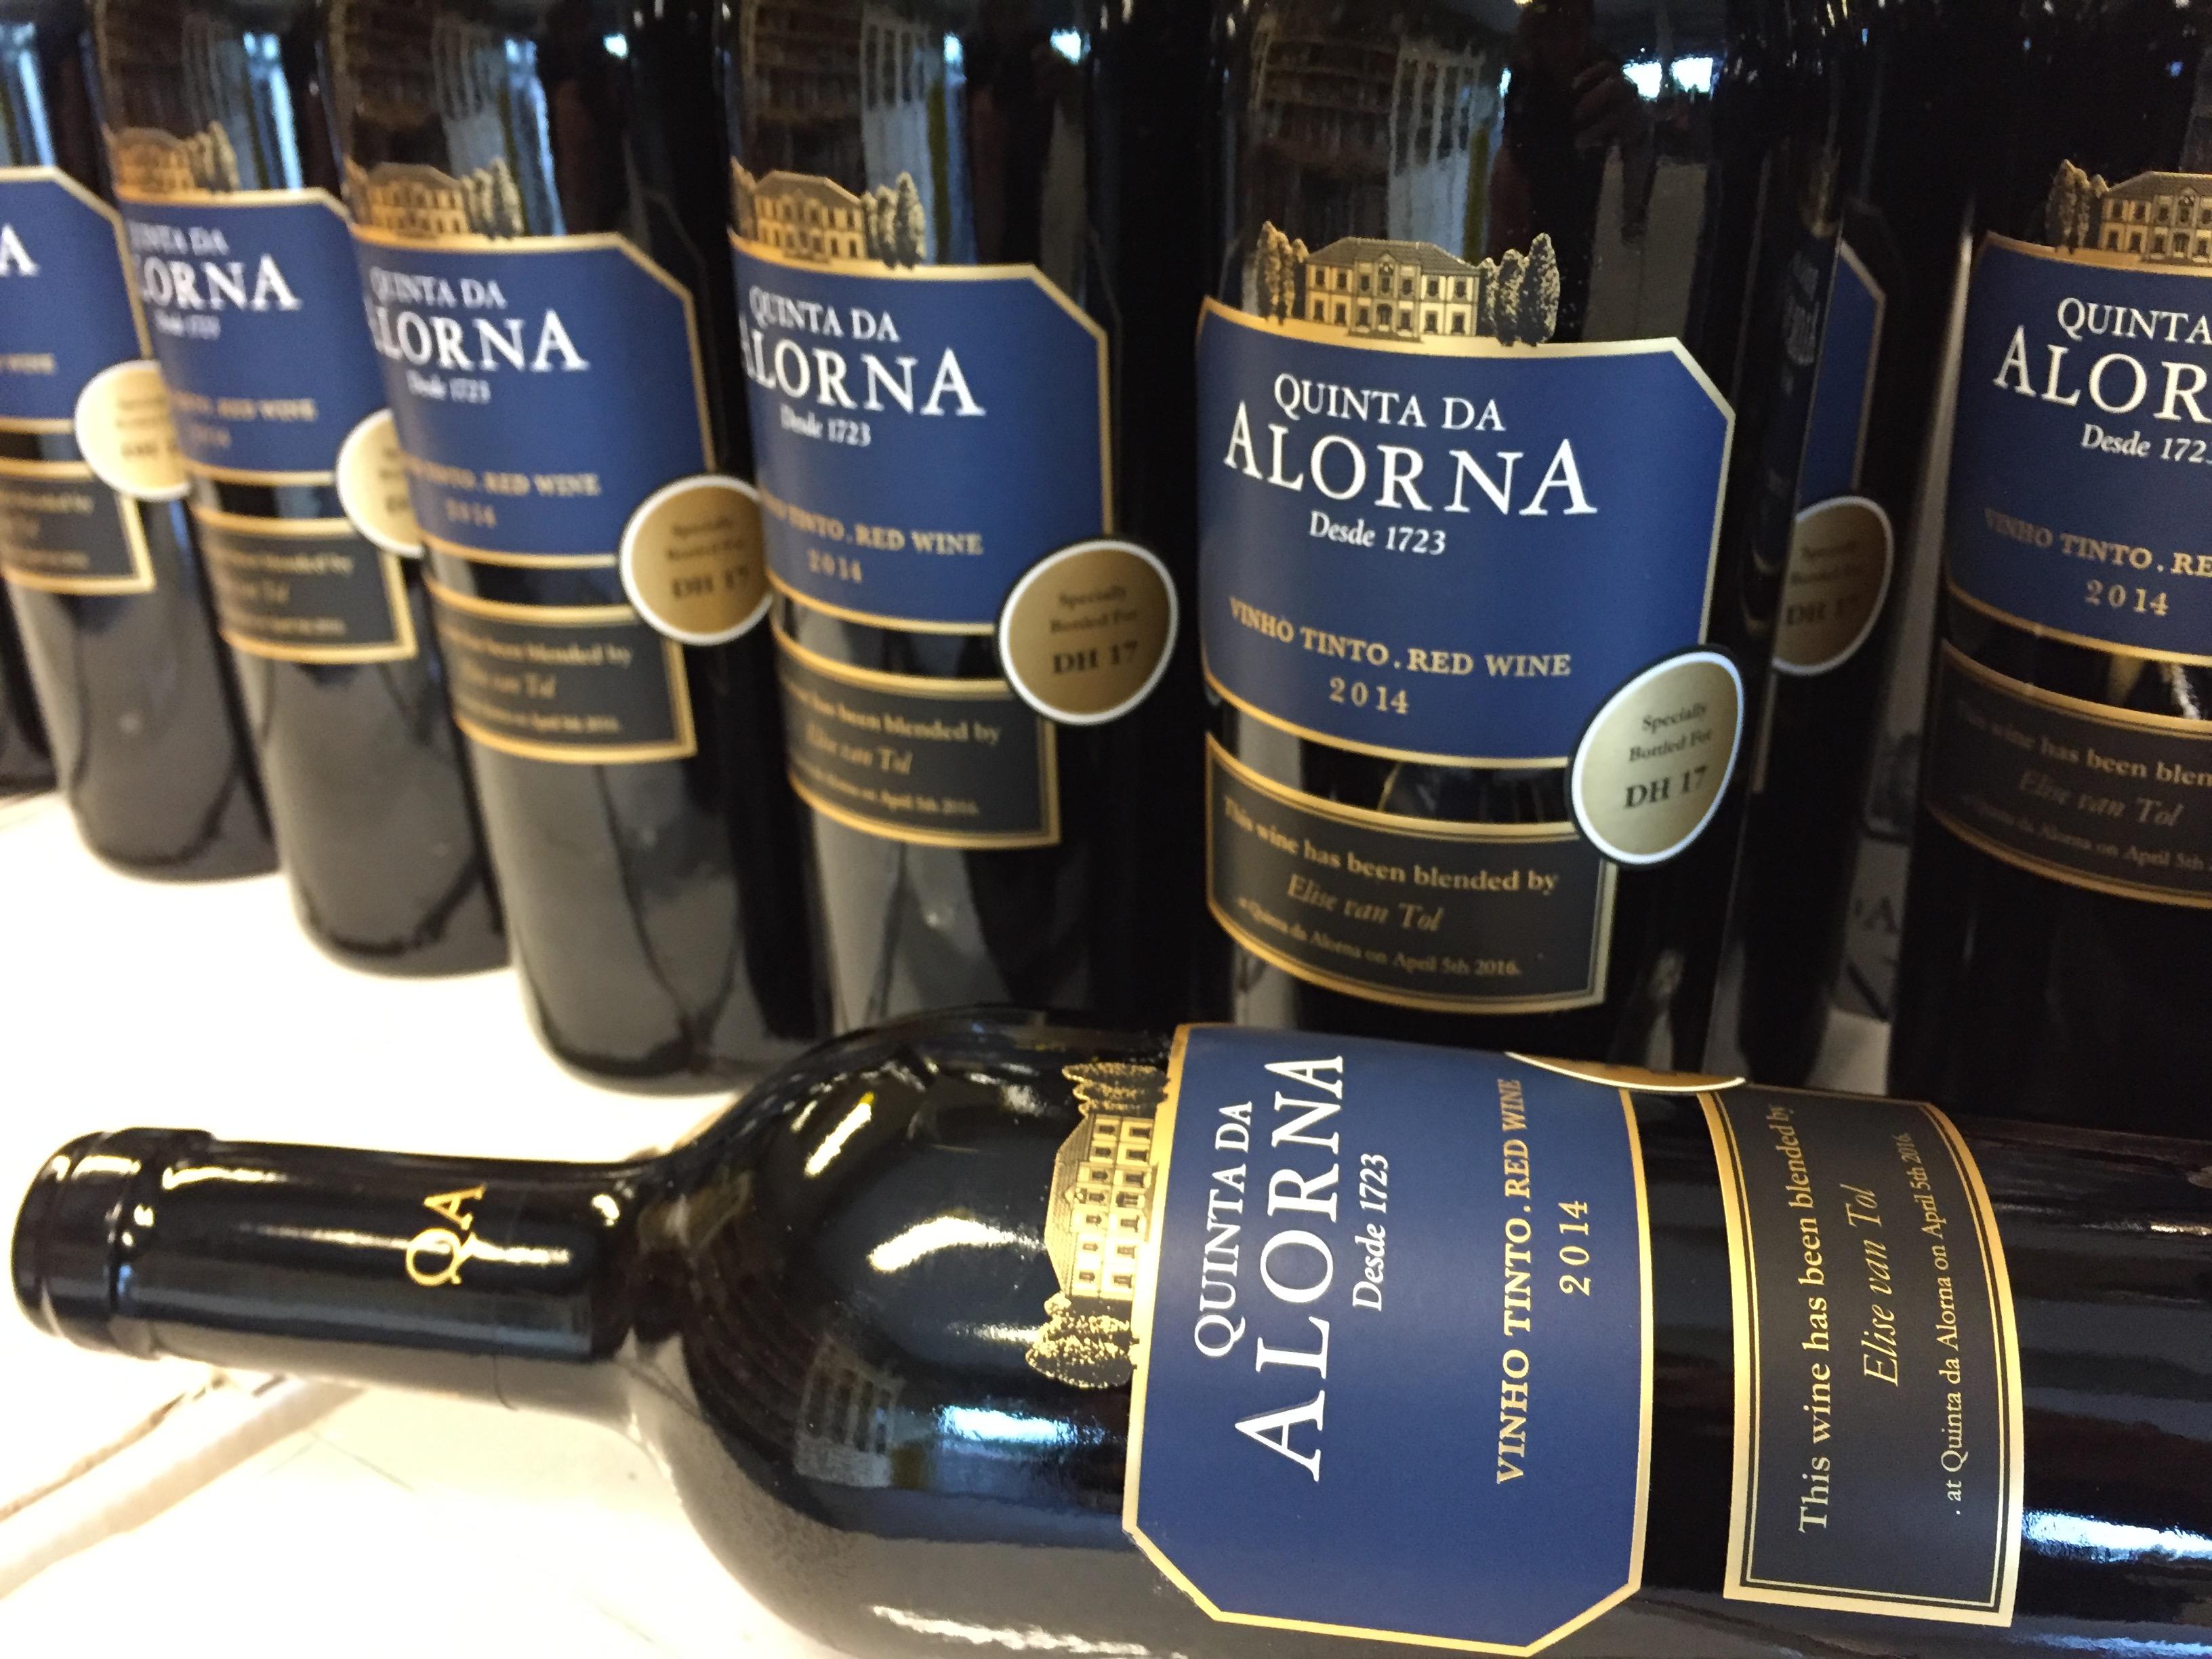 Onze 'eigen' wijn! Quinta da Alorna 2014 Cuvée DH17